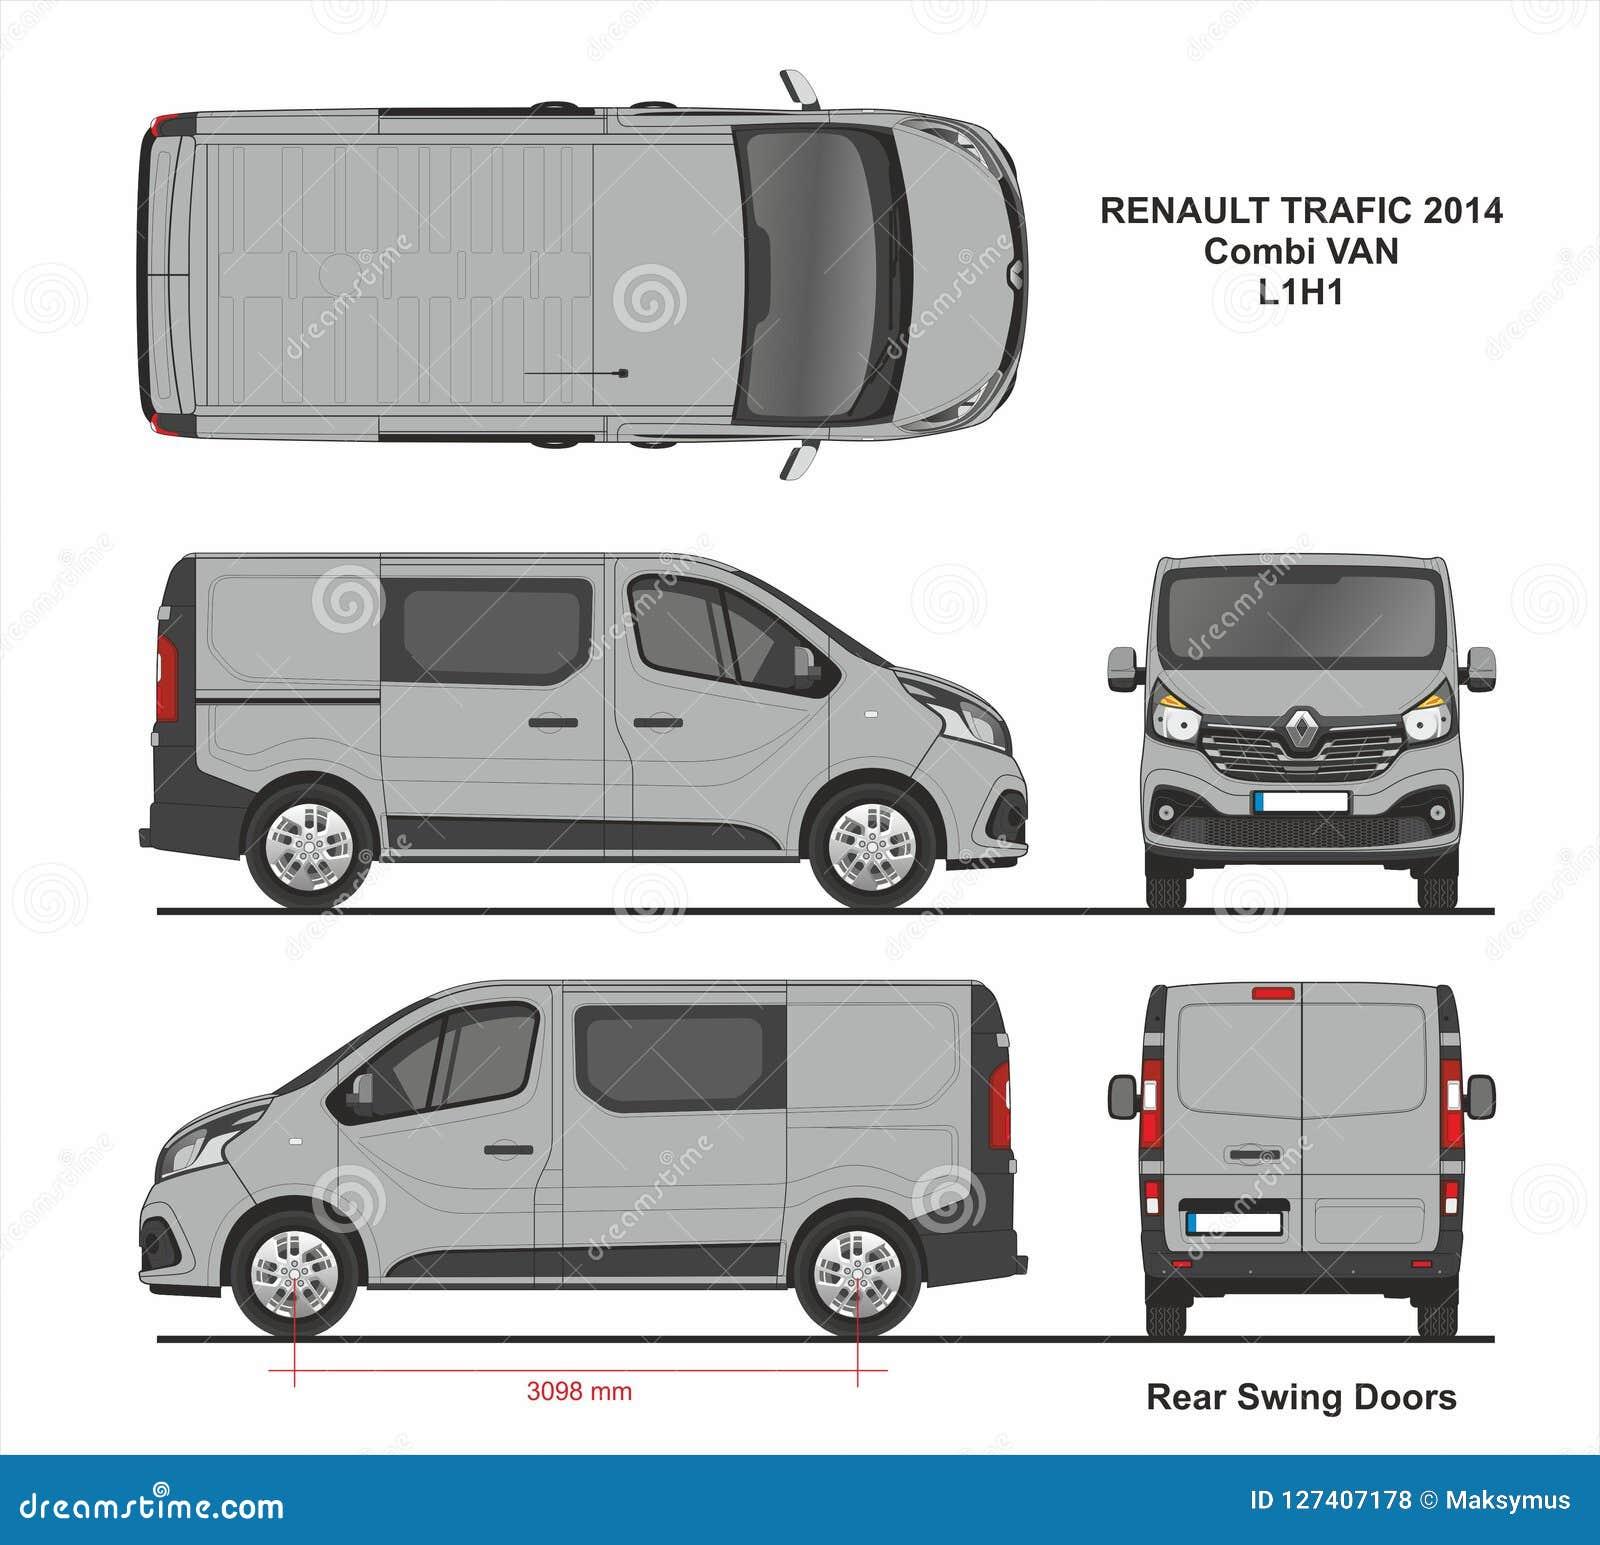 Renault Trafic Combi Delivery Van L1H1 2014 Photo Stock